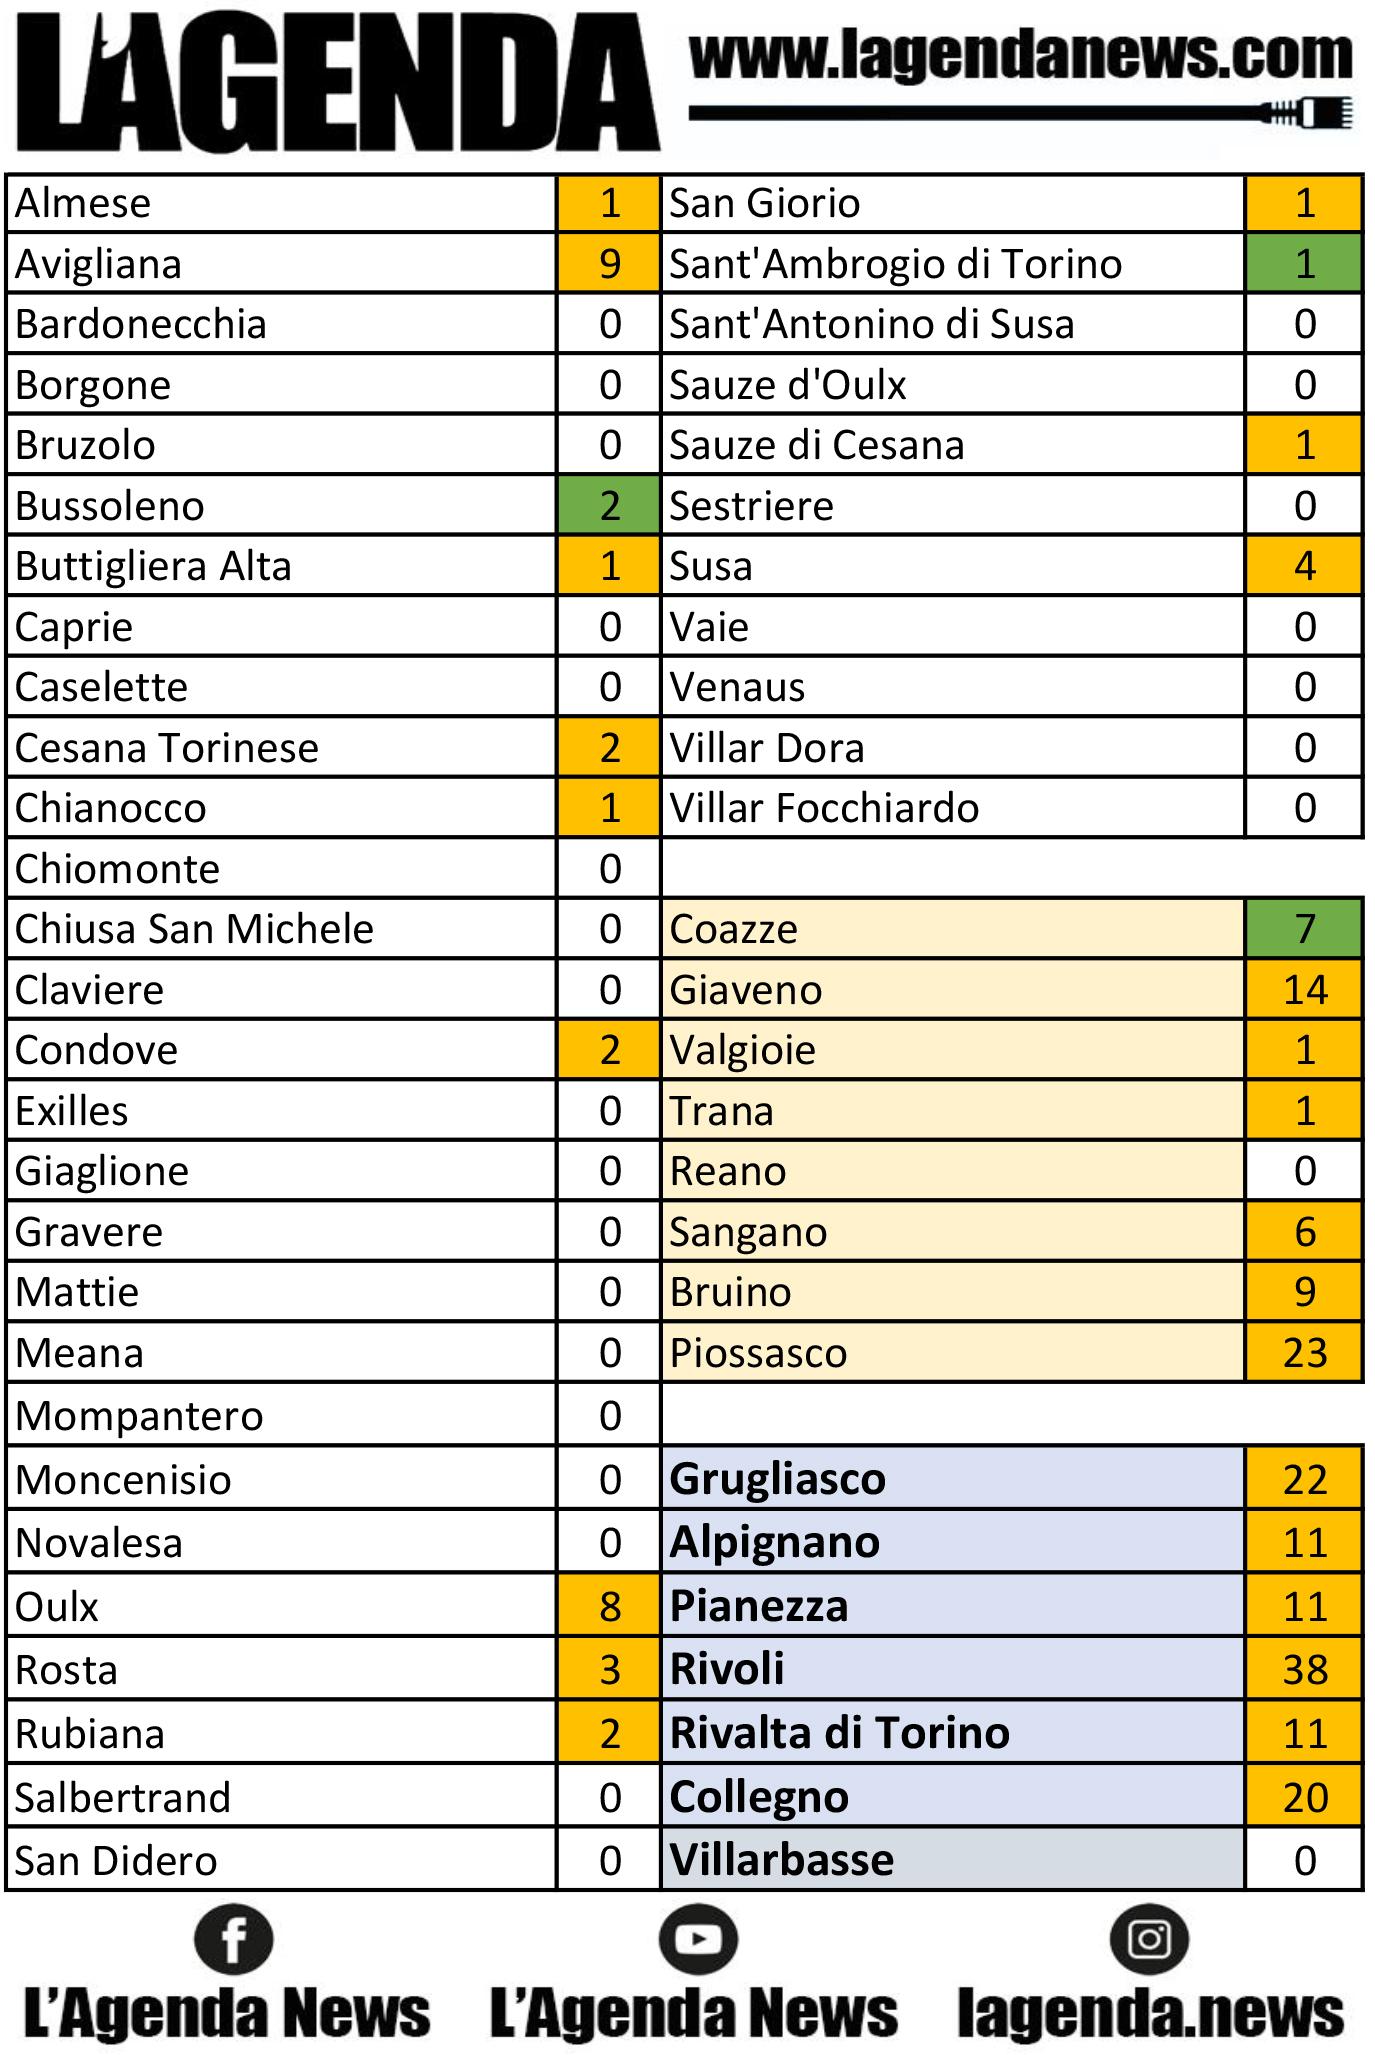 tabella coronavirus 14